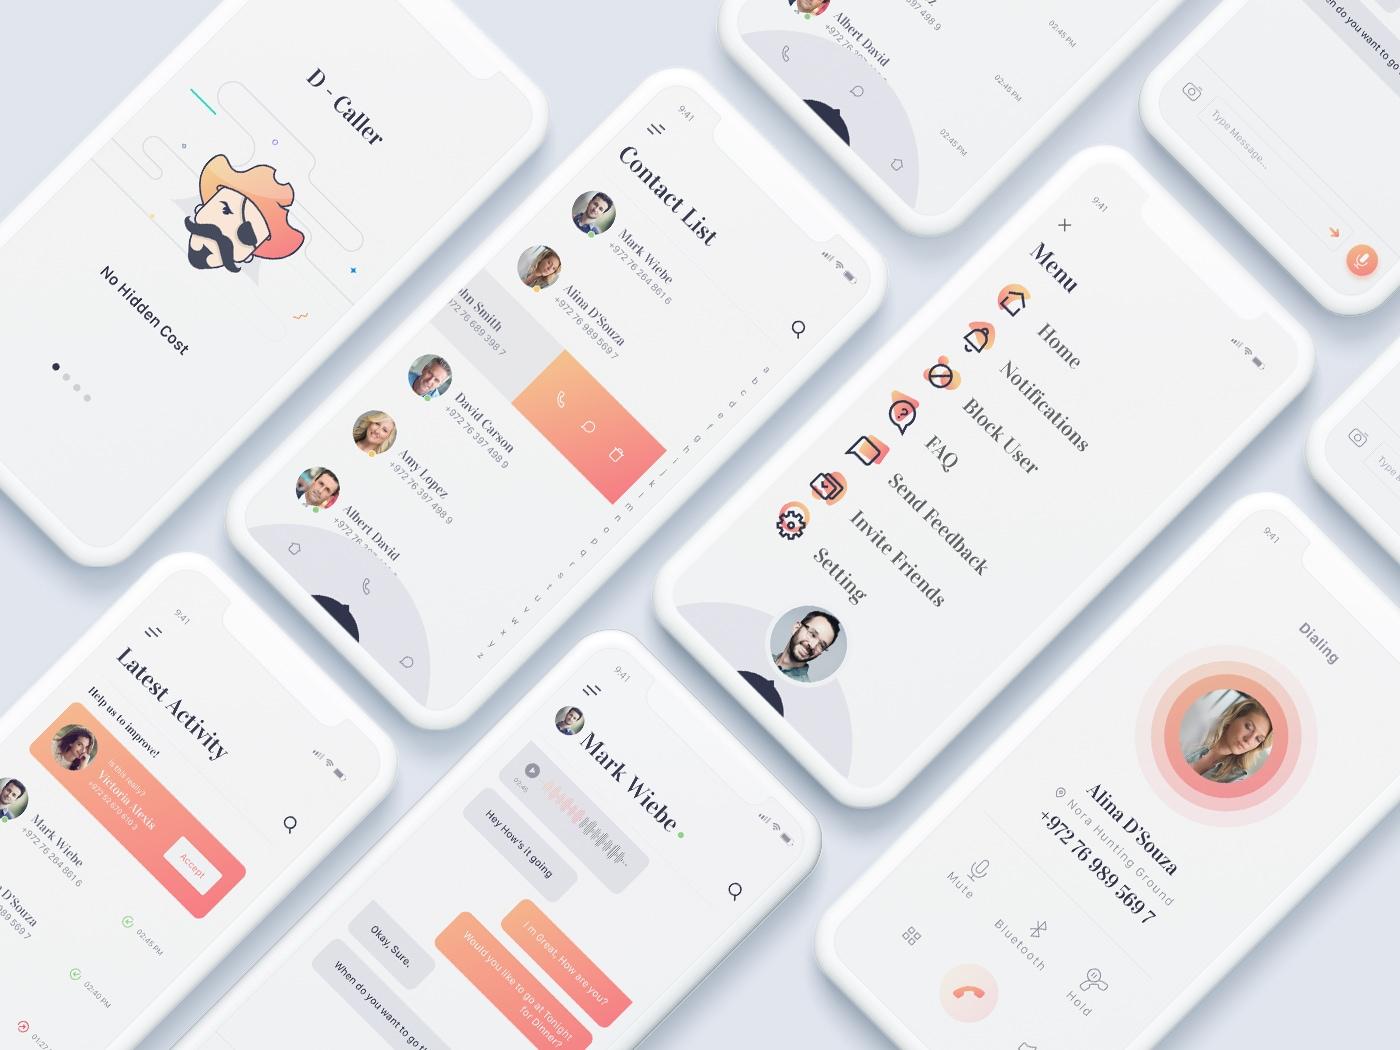 D-Caller移动用户界面工具包-Decojent提供的干净优雅的App,有6个屏幕可供您入门